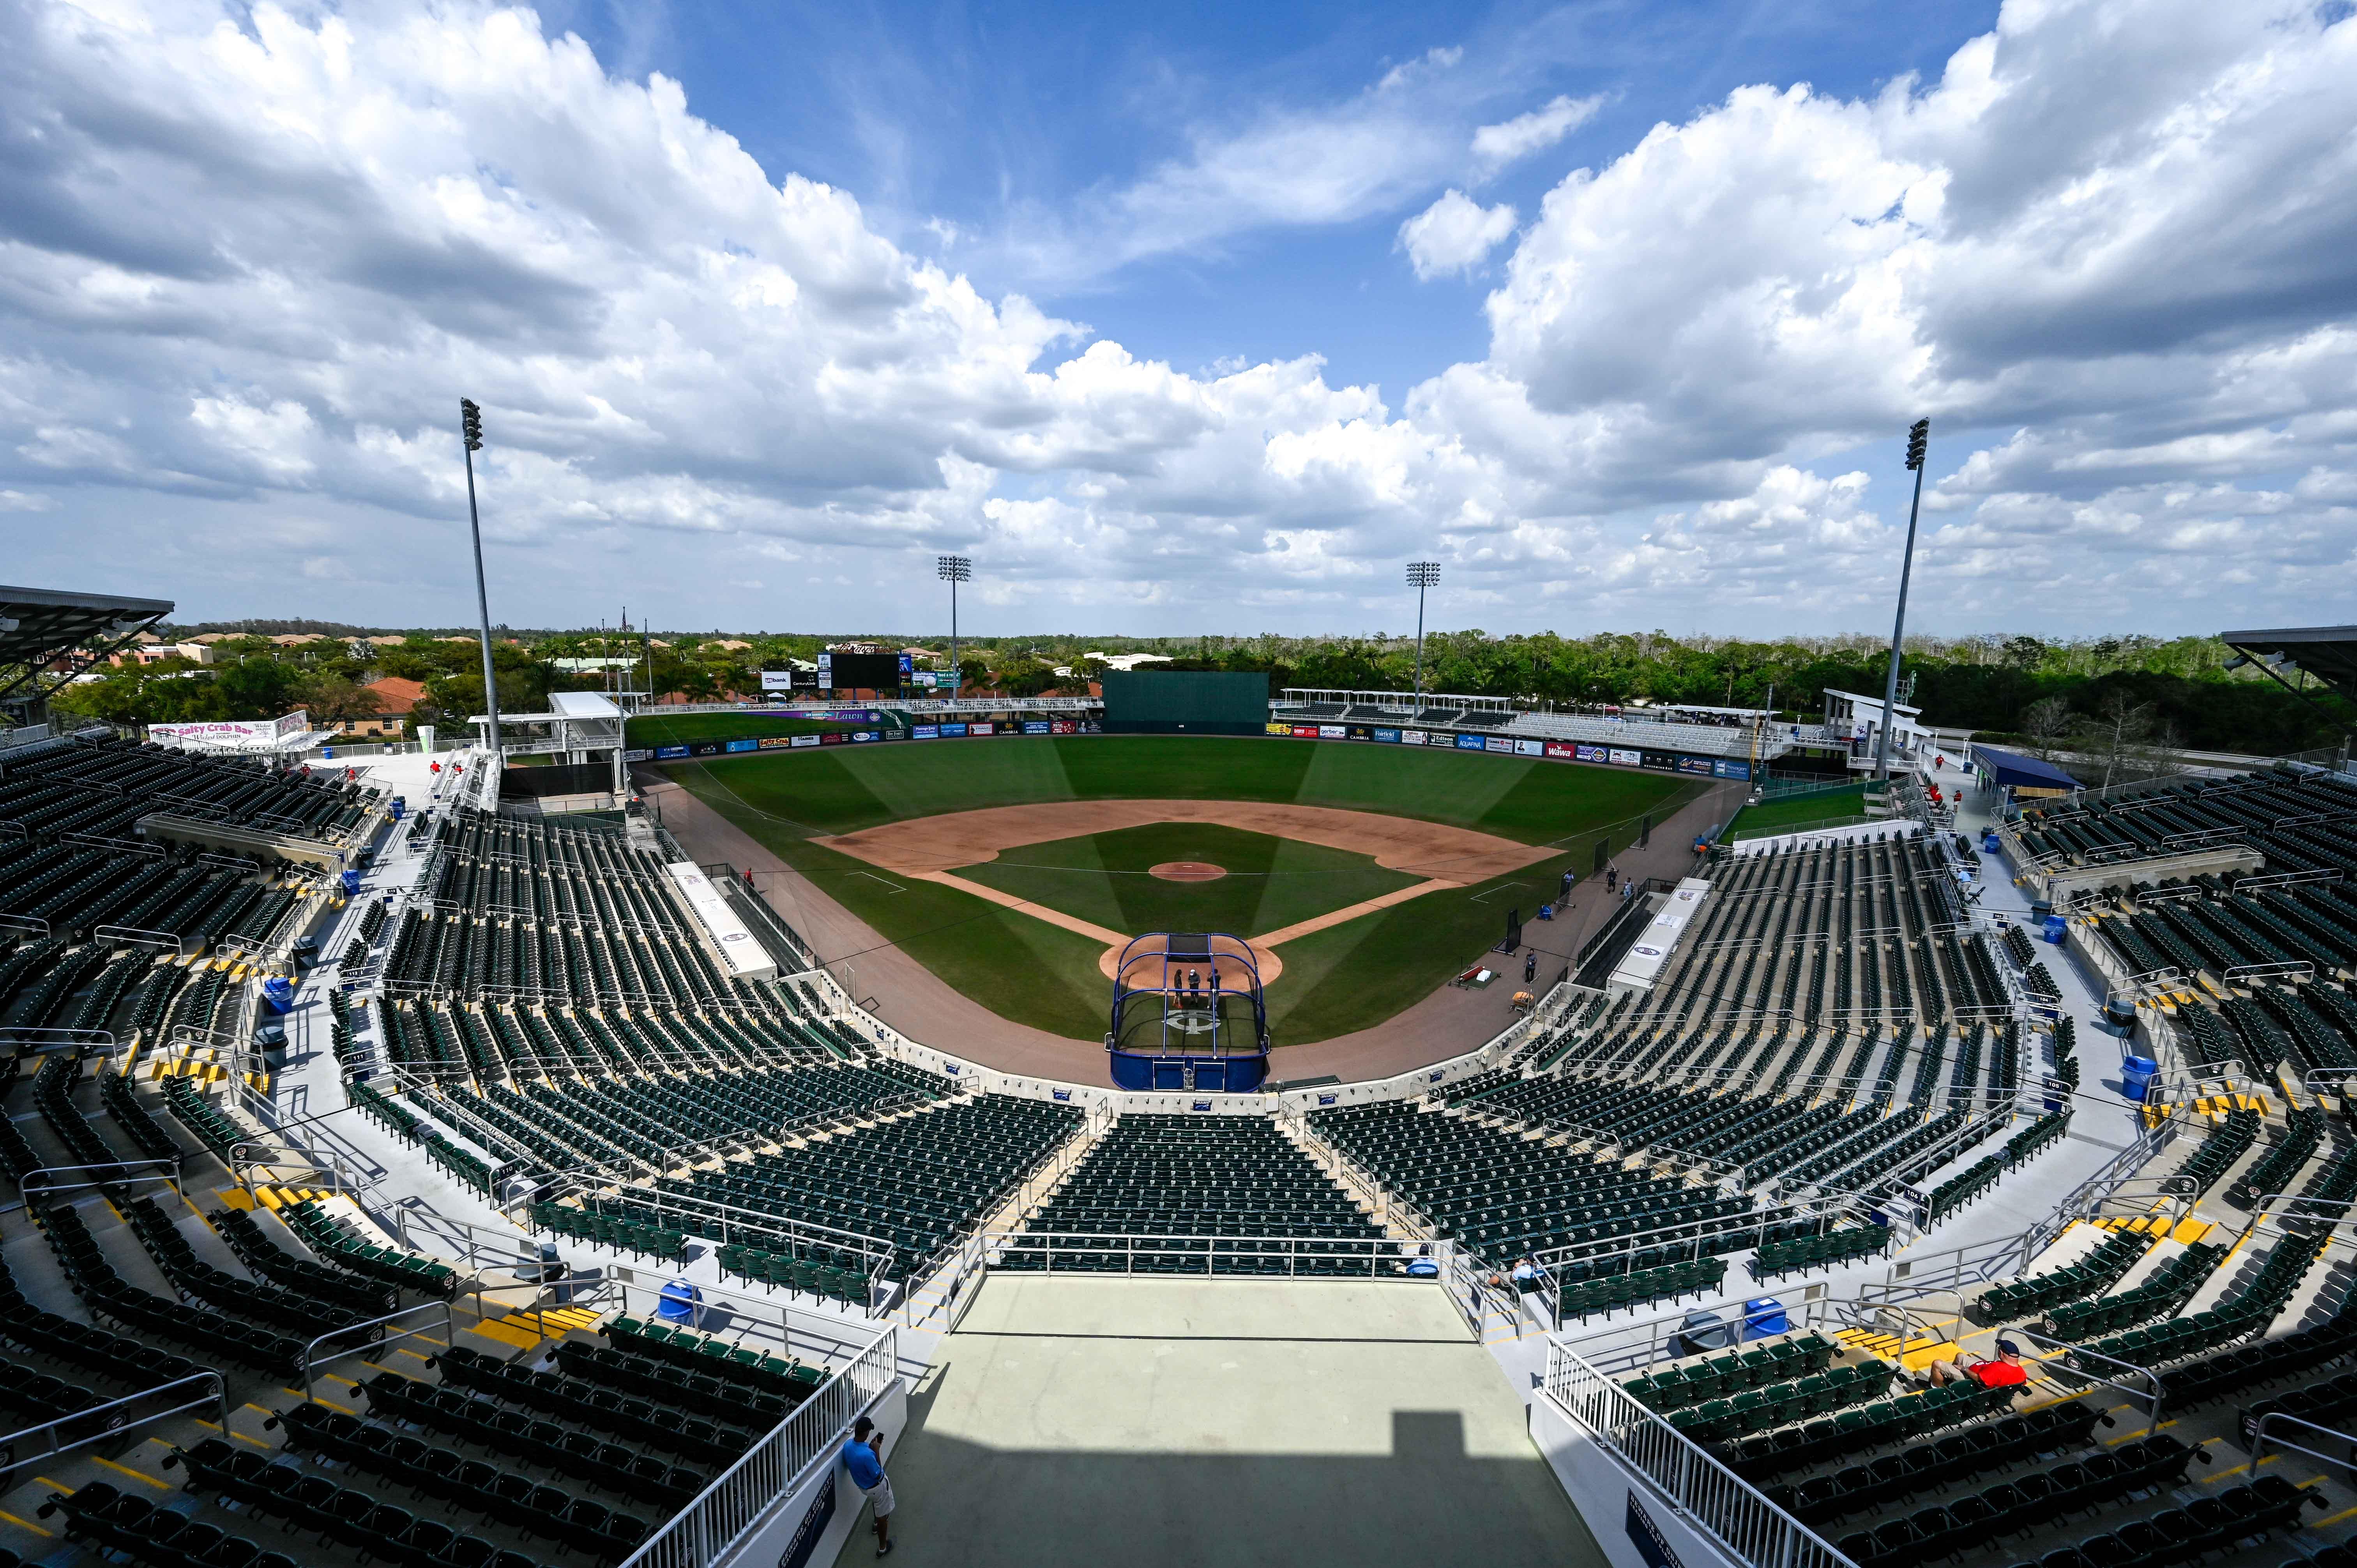 MLB closing all spring training facilities in Arizona and Florida to curb coronavirus spread